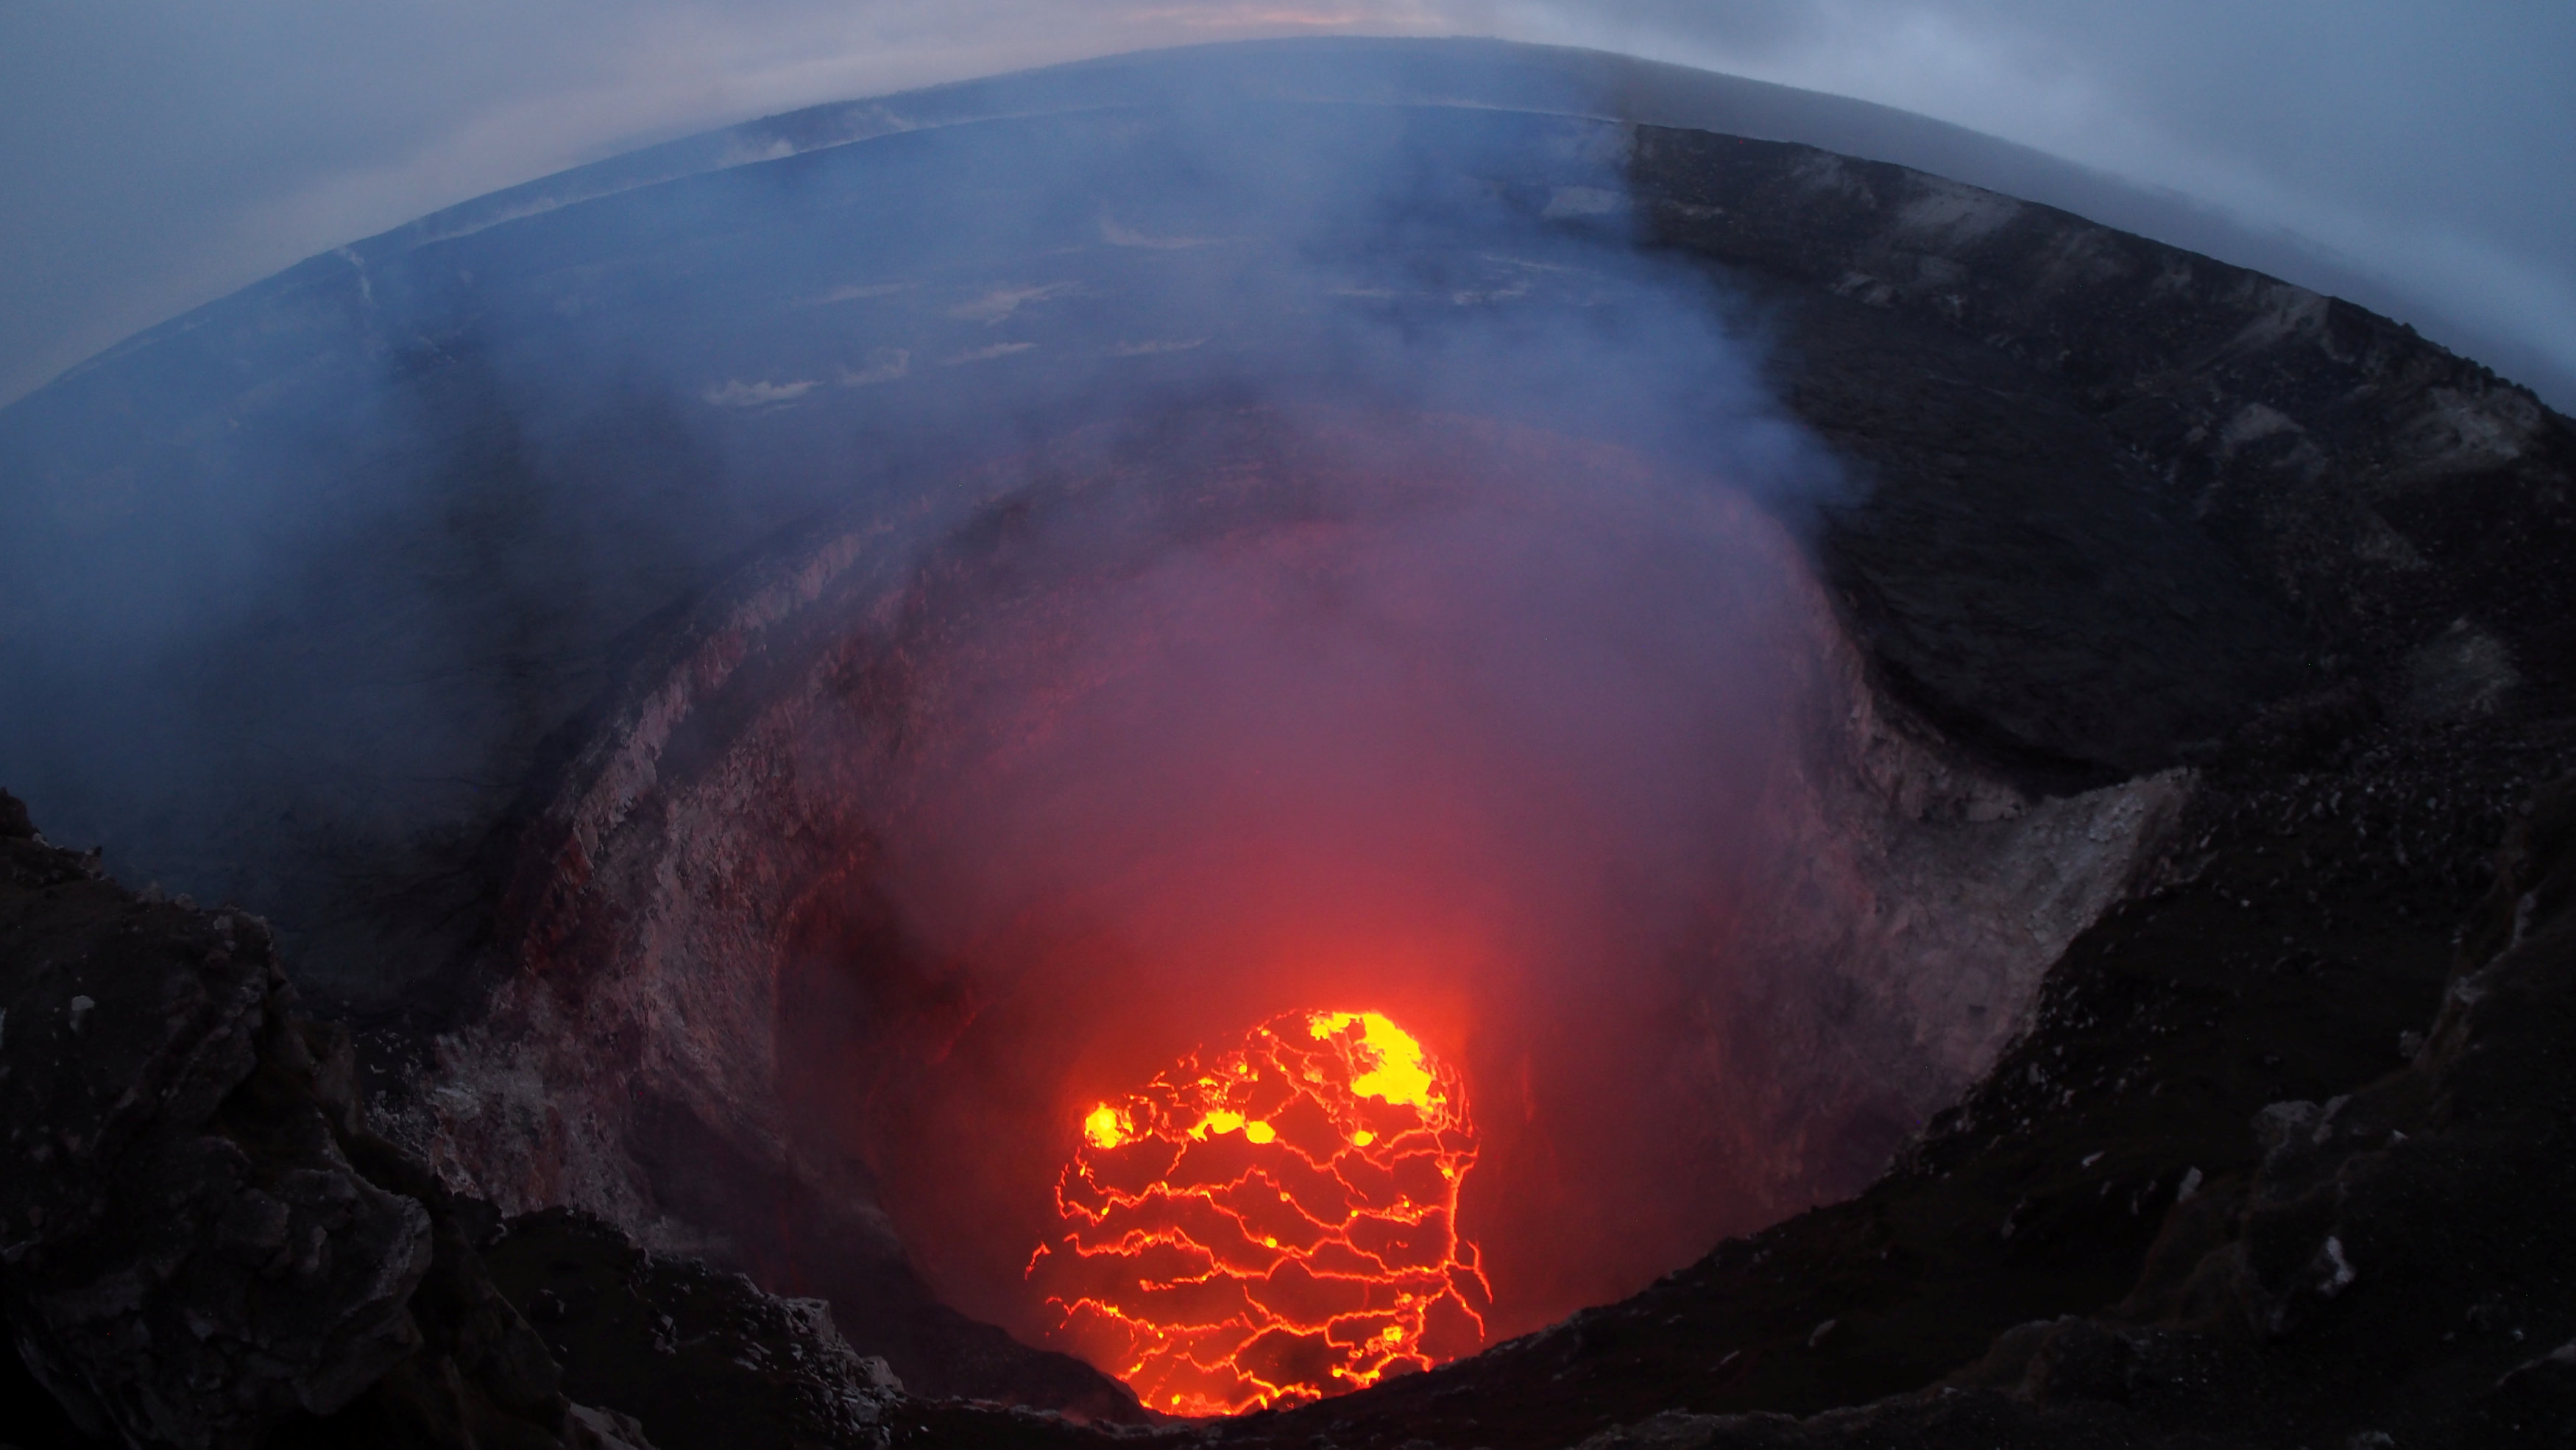 chavai-i-lava-toy-kilaoyea-katestrepse-dekades-spitia-amp-8211-chiliades-polites-ekkenonoyn-katoikimenes-perioches-foto3